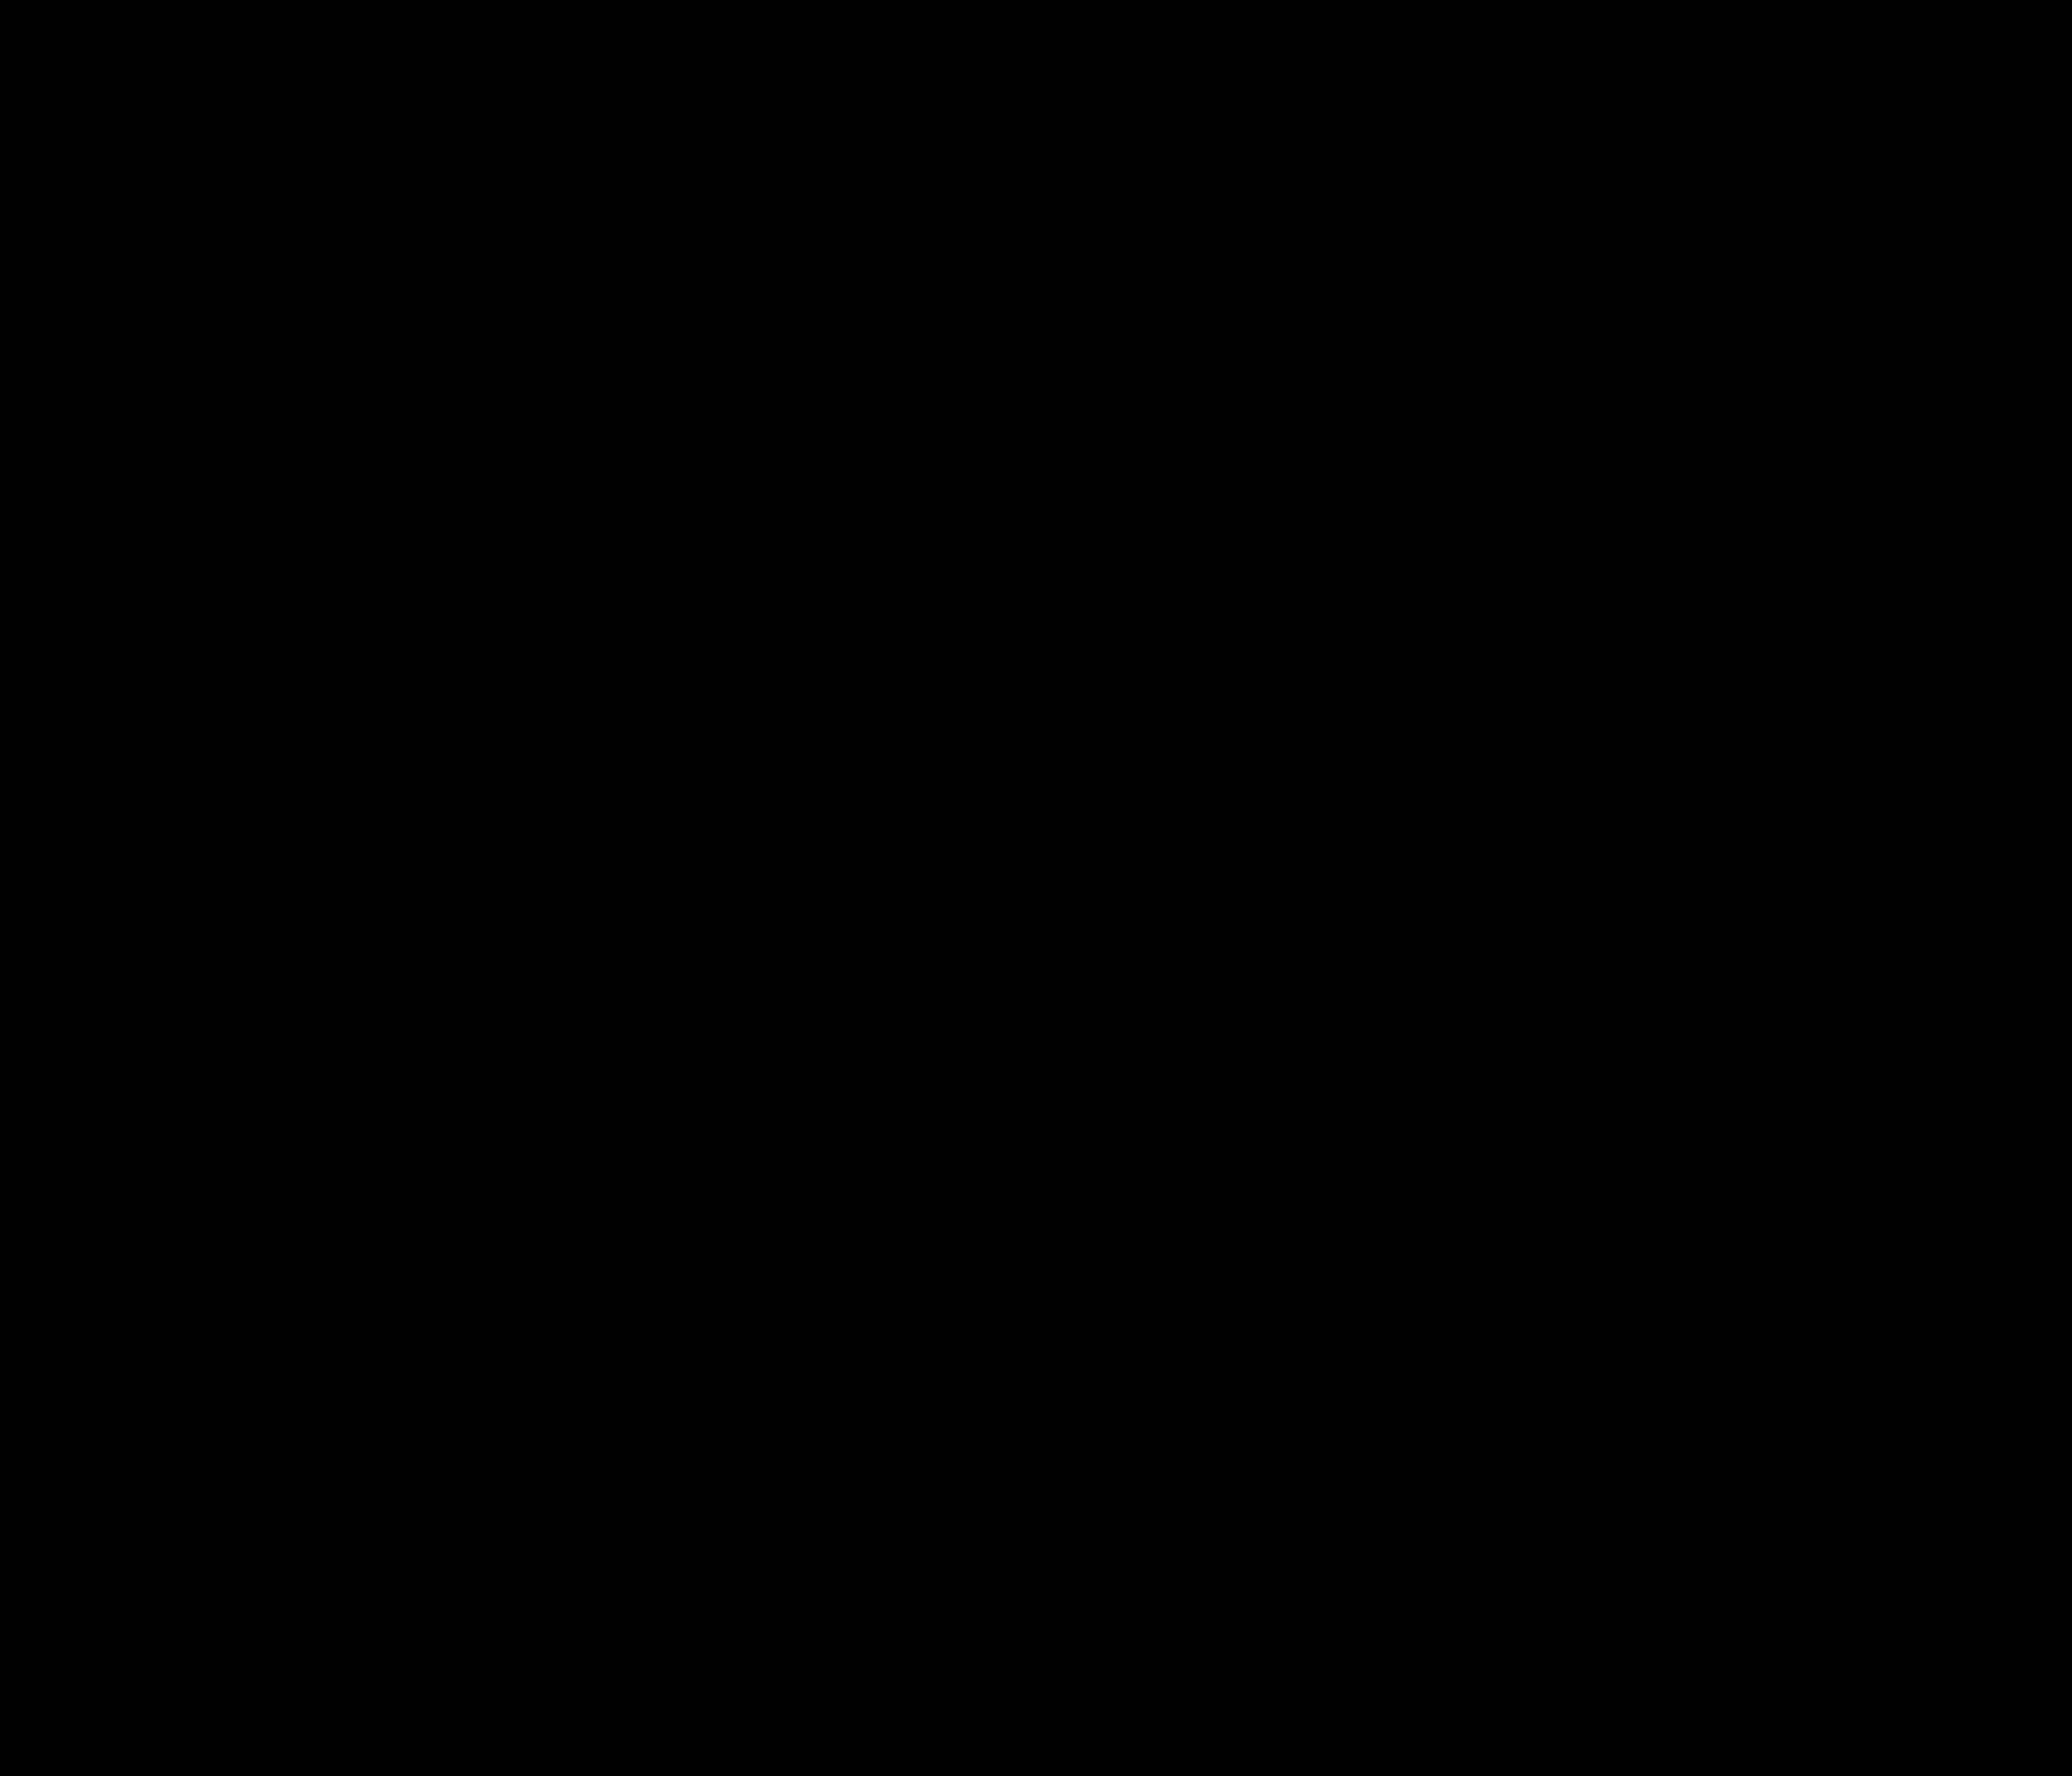 Diagram Letter C Hd Png Transparent Letter C Hd Png Images